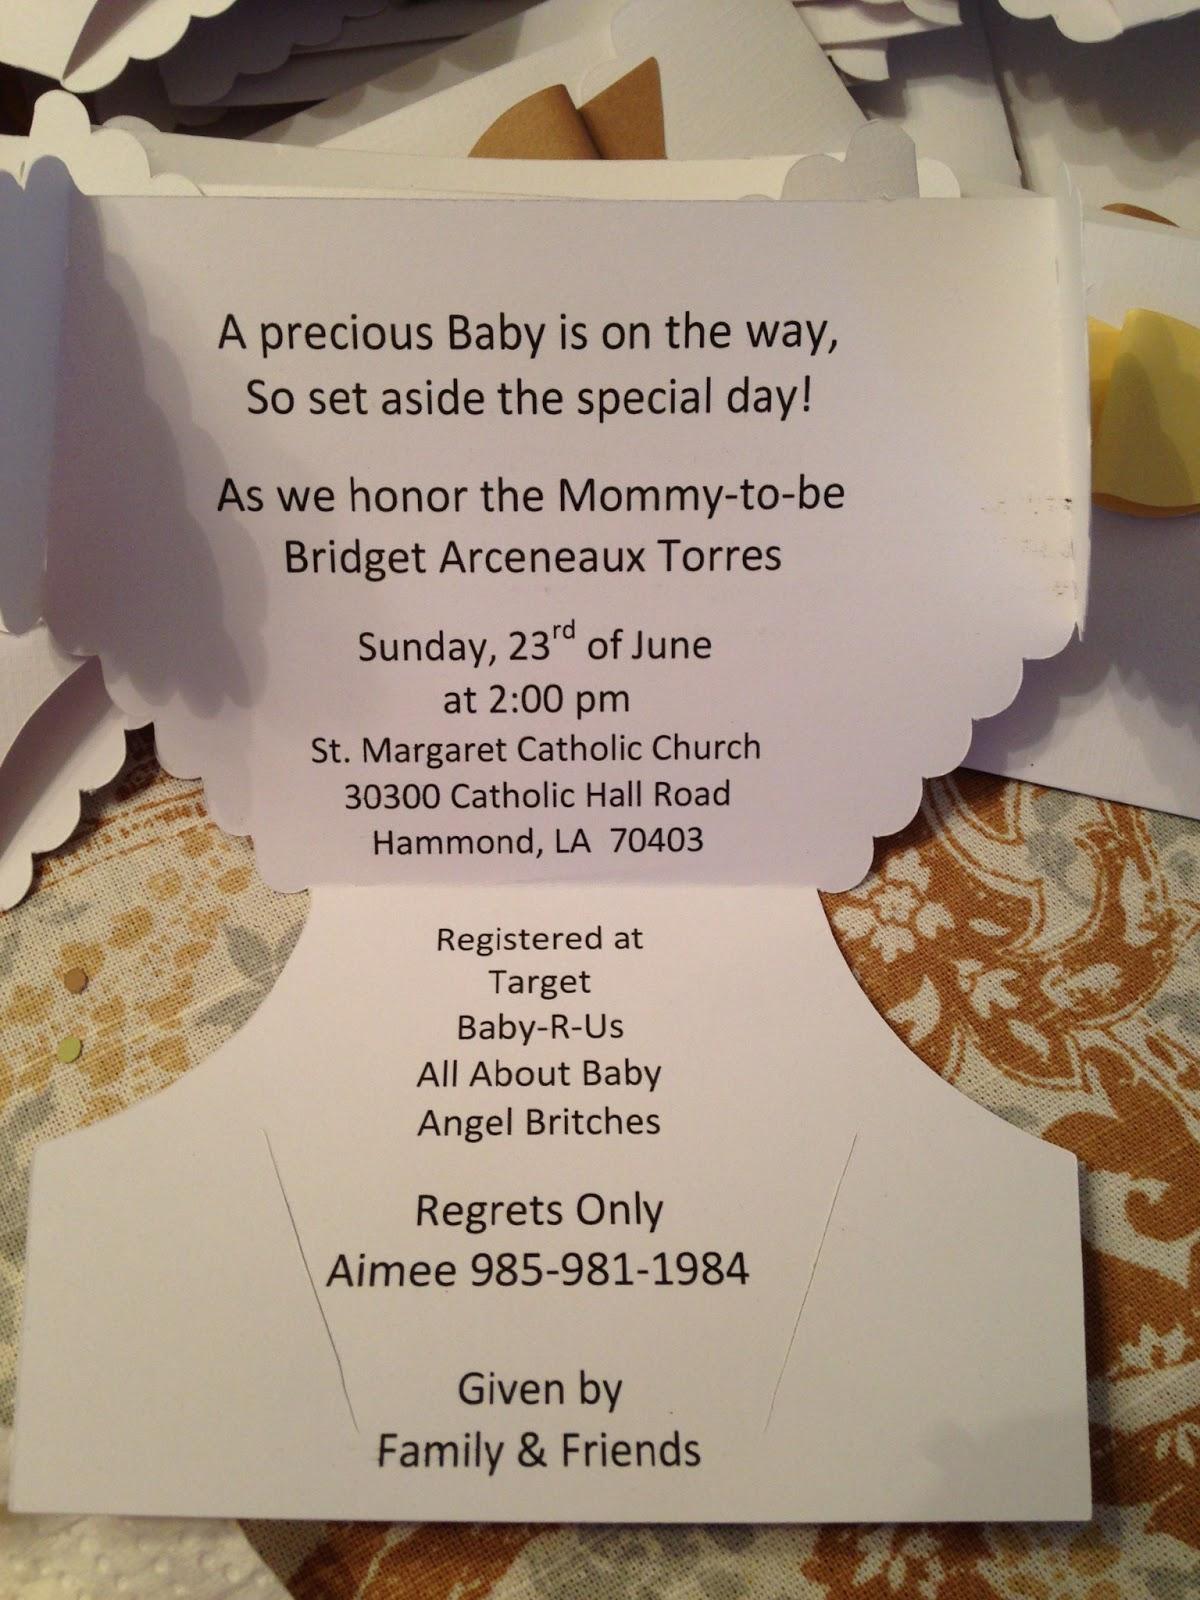 Scrapbook pad ink baby shower invites using artiste baby shower invites using artiste filmwisefo